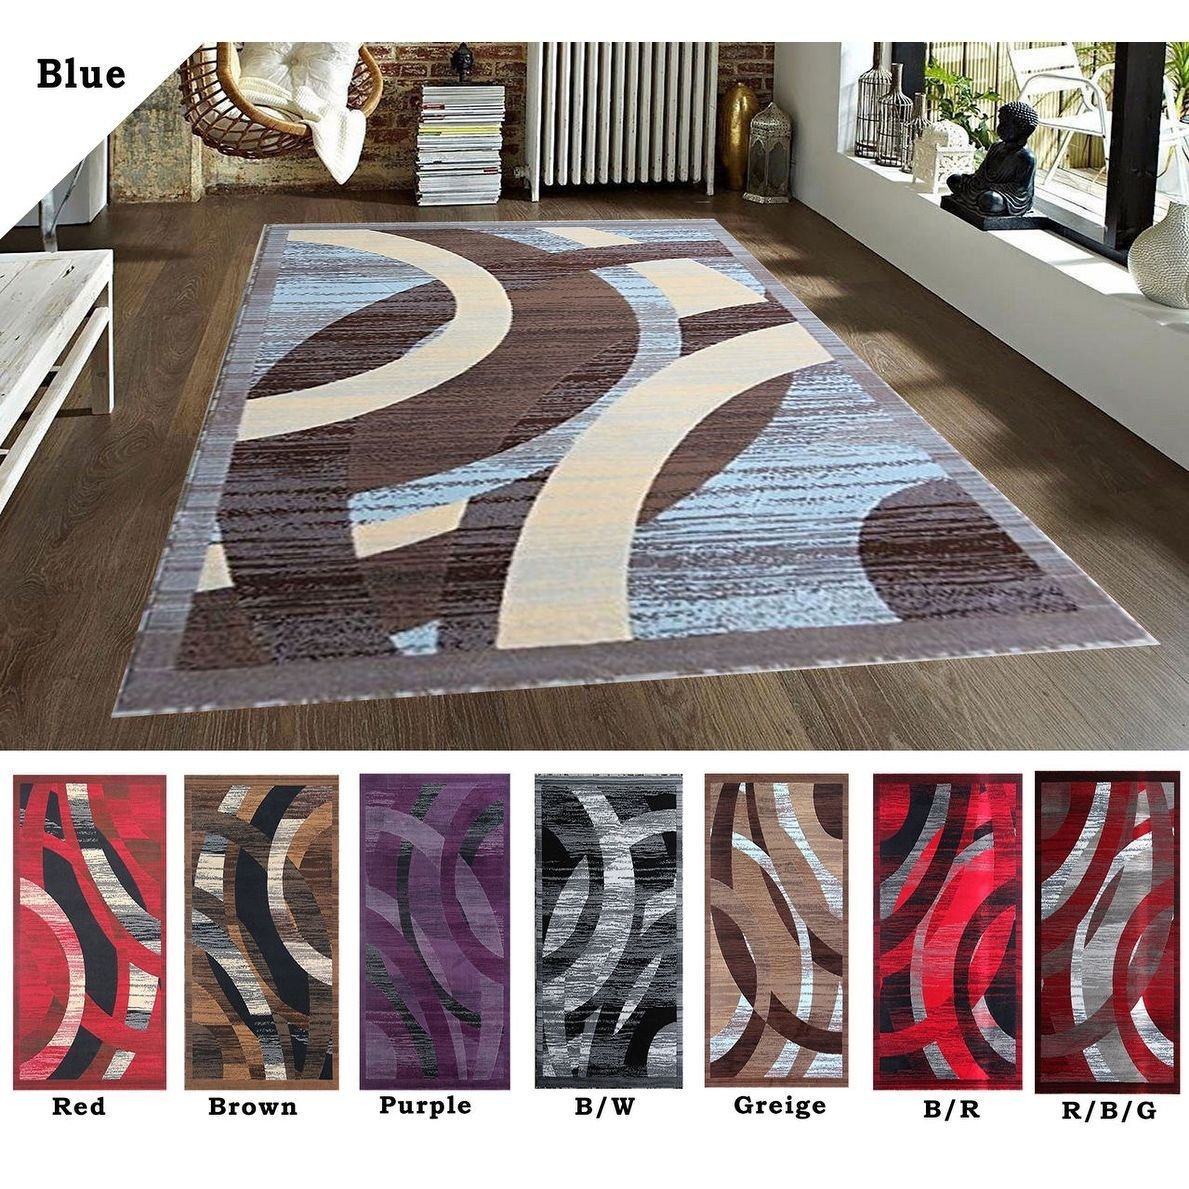 2x8 5x7 3 8x10 Rug Carpet Area Rug Blue Red Brown Purple Black